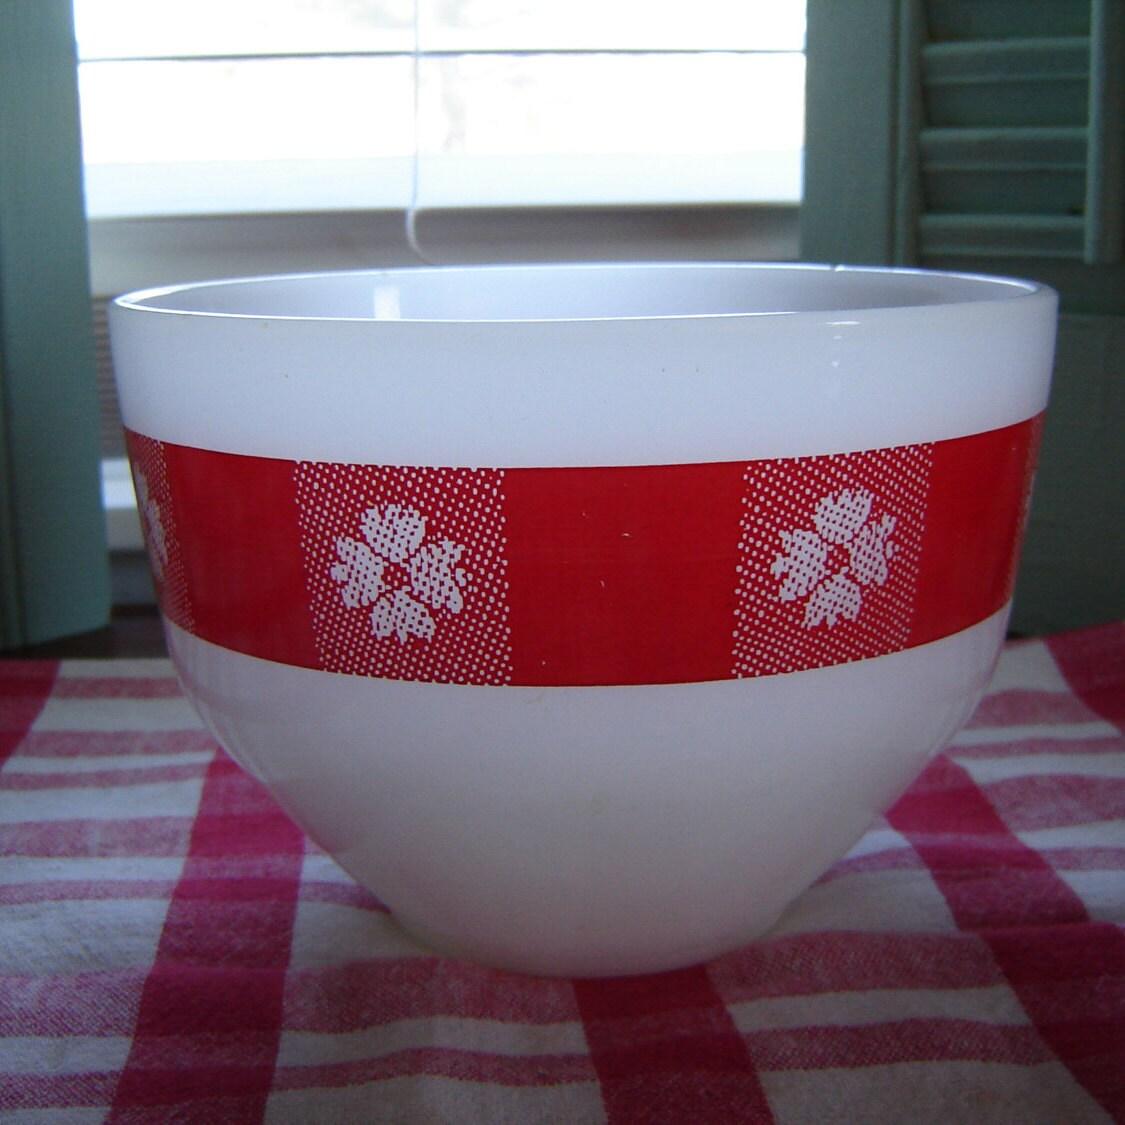 Vintage Kitchen Bowls: Vintage Bowl Red And White Kitchen Decor Retro Milkglass Bowl